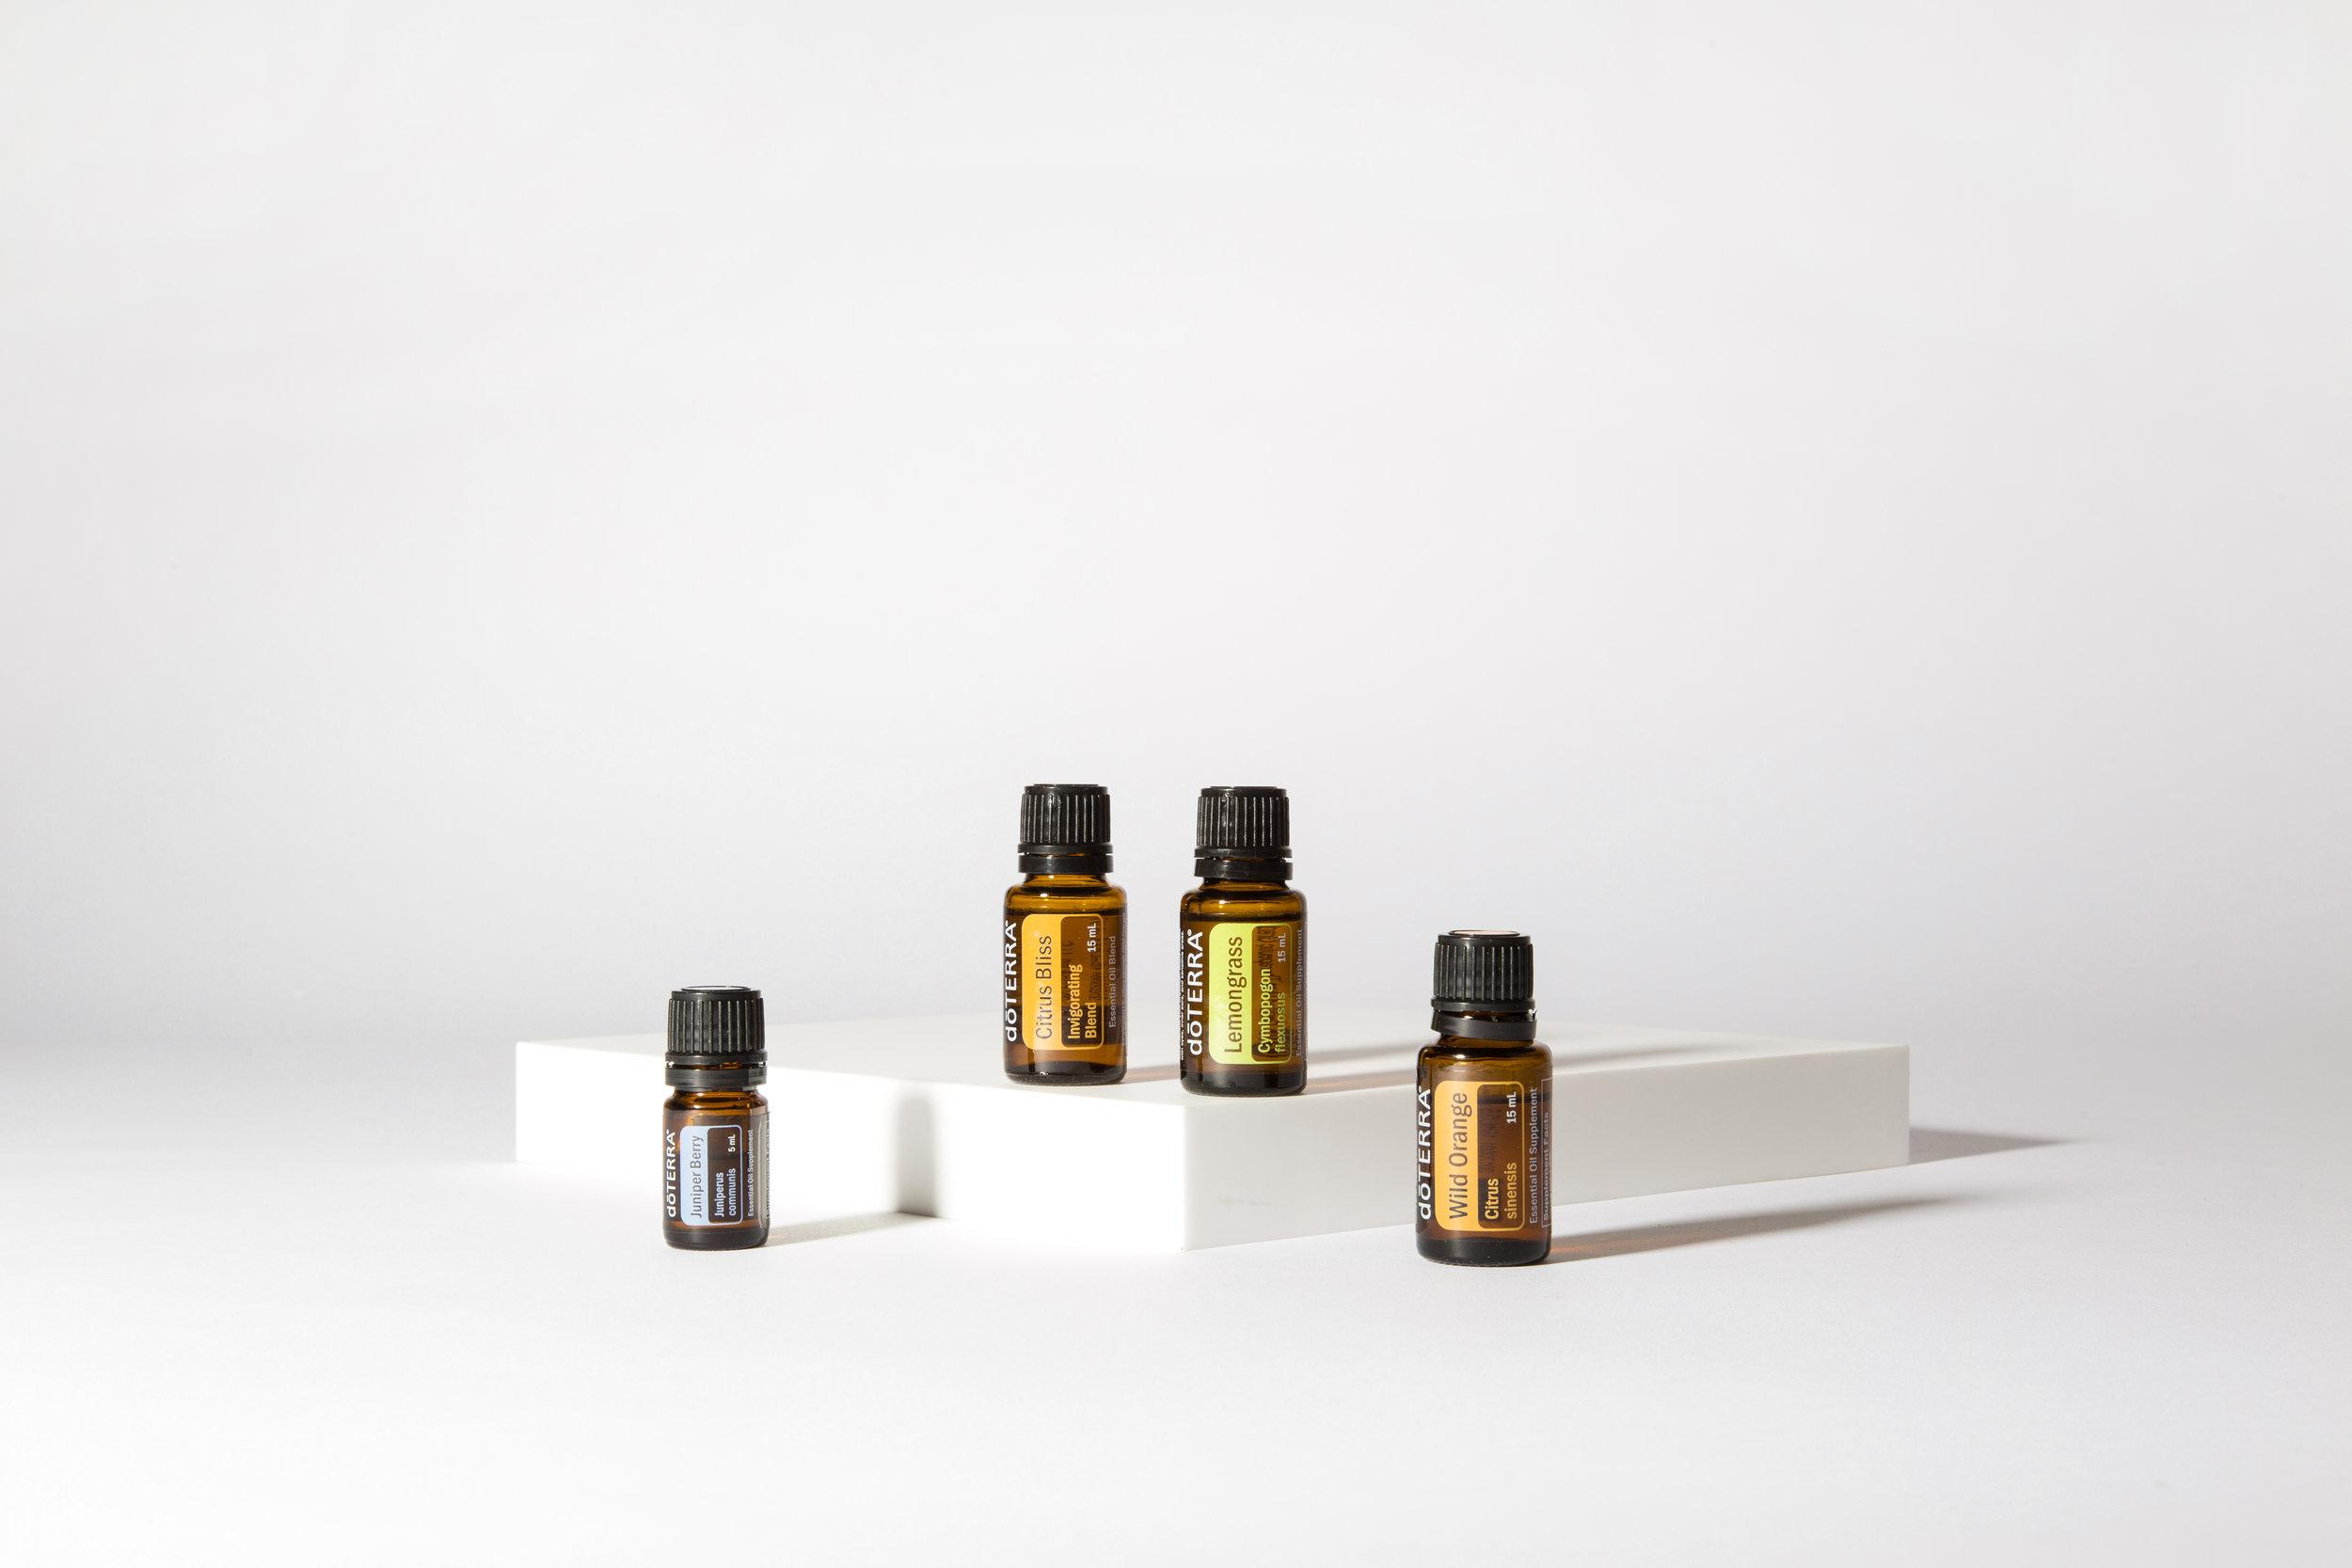 free 15ml lemograsss - Thyroid, muscles, digestion